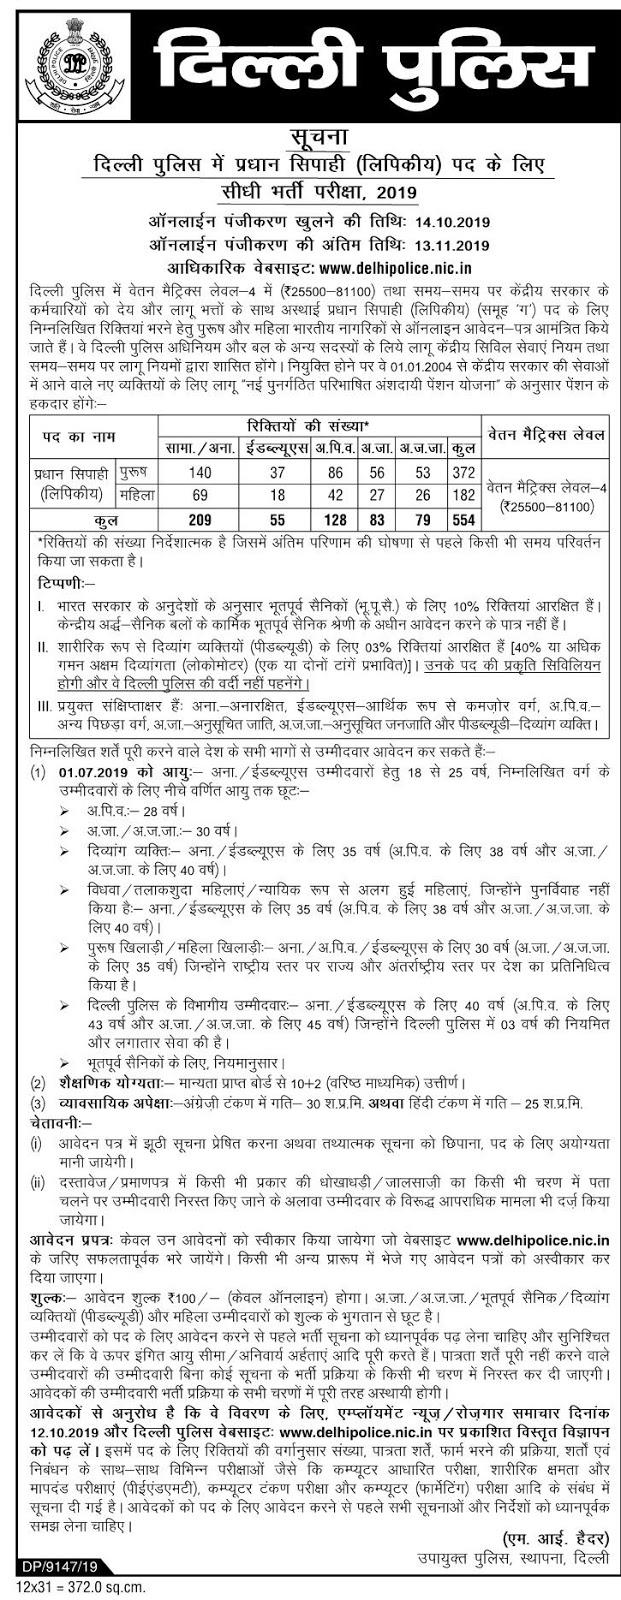 delhi police notification Hindi